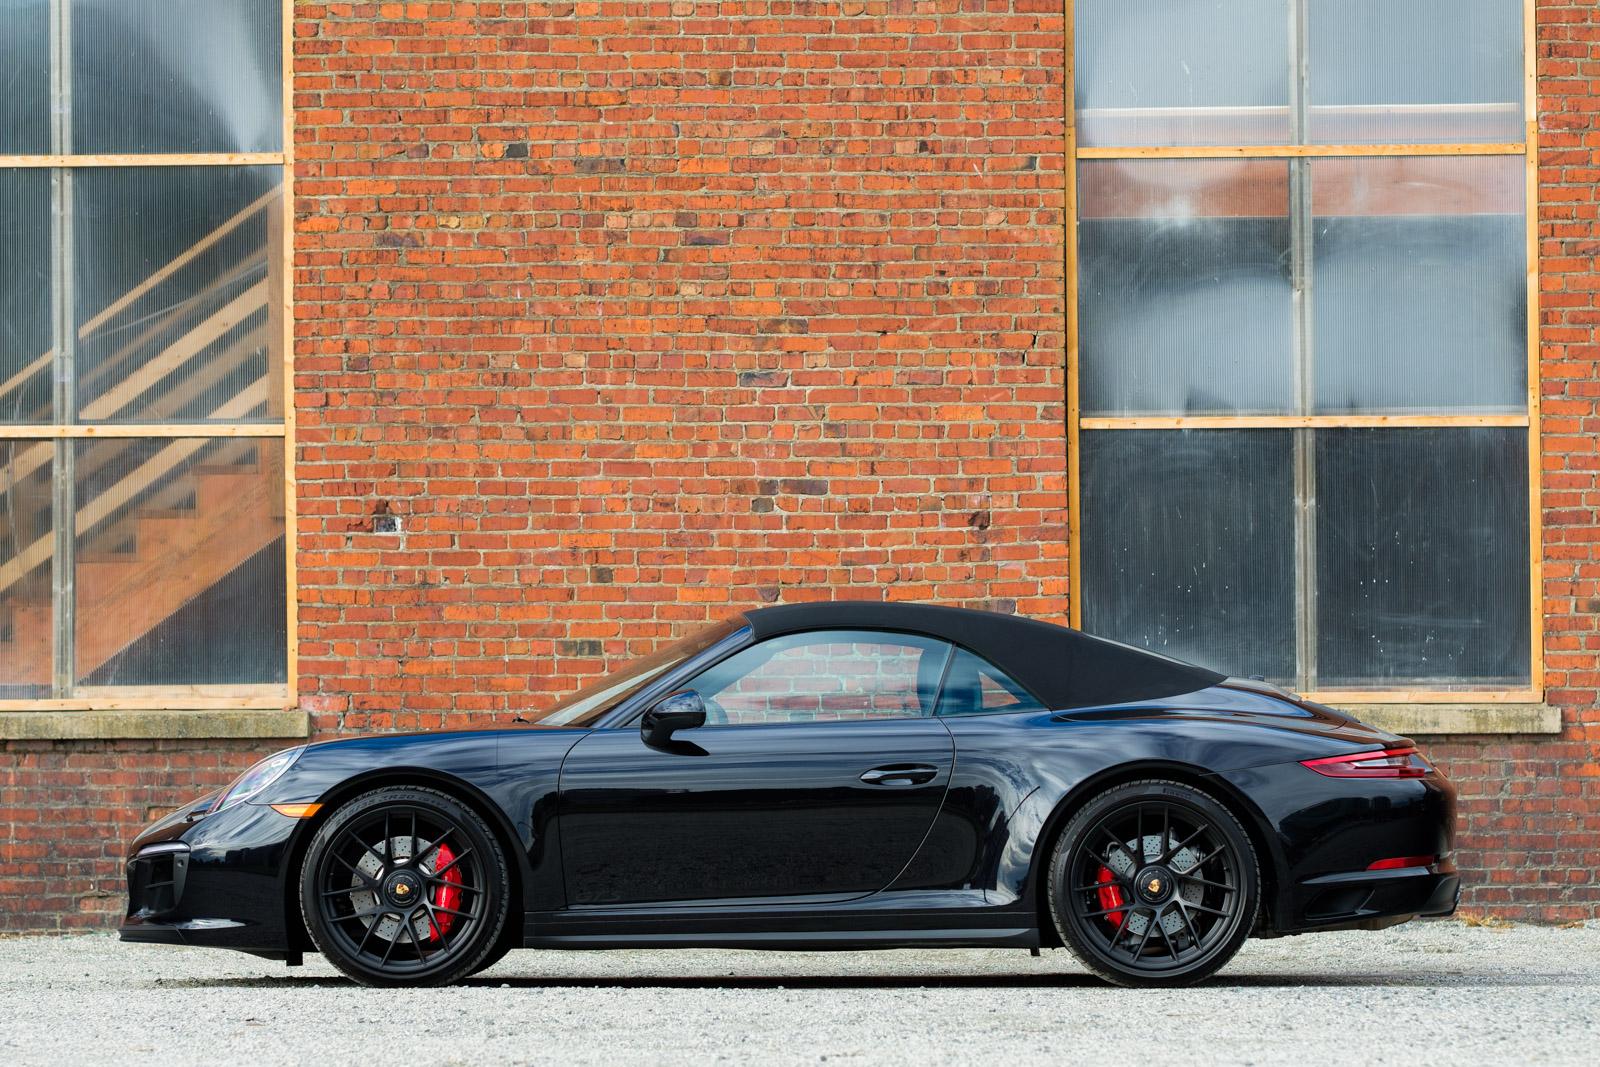 2018 Porsche 911 Carrera 4 Gts Cabriolet Silver Arrow Cars Ltd